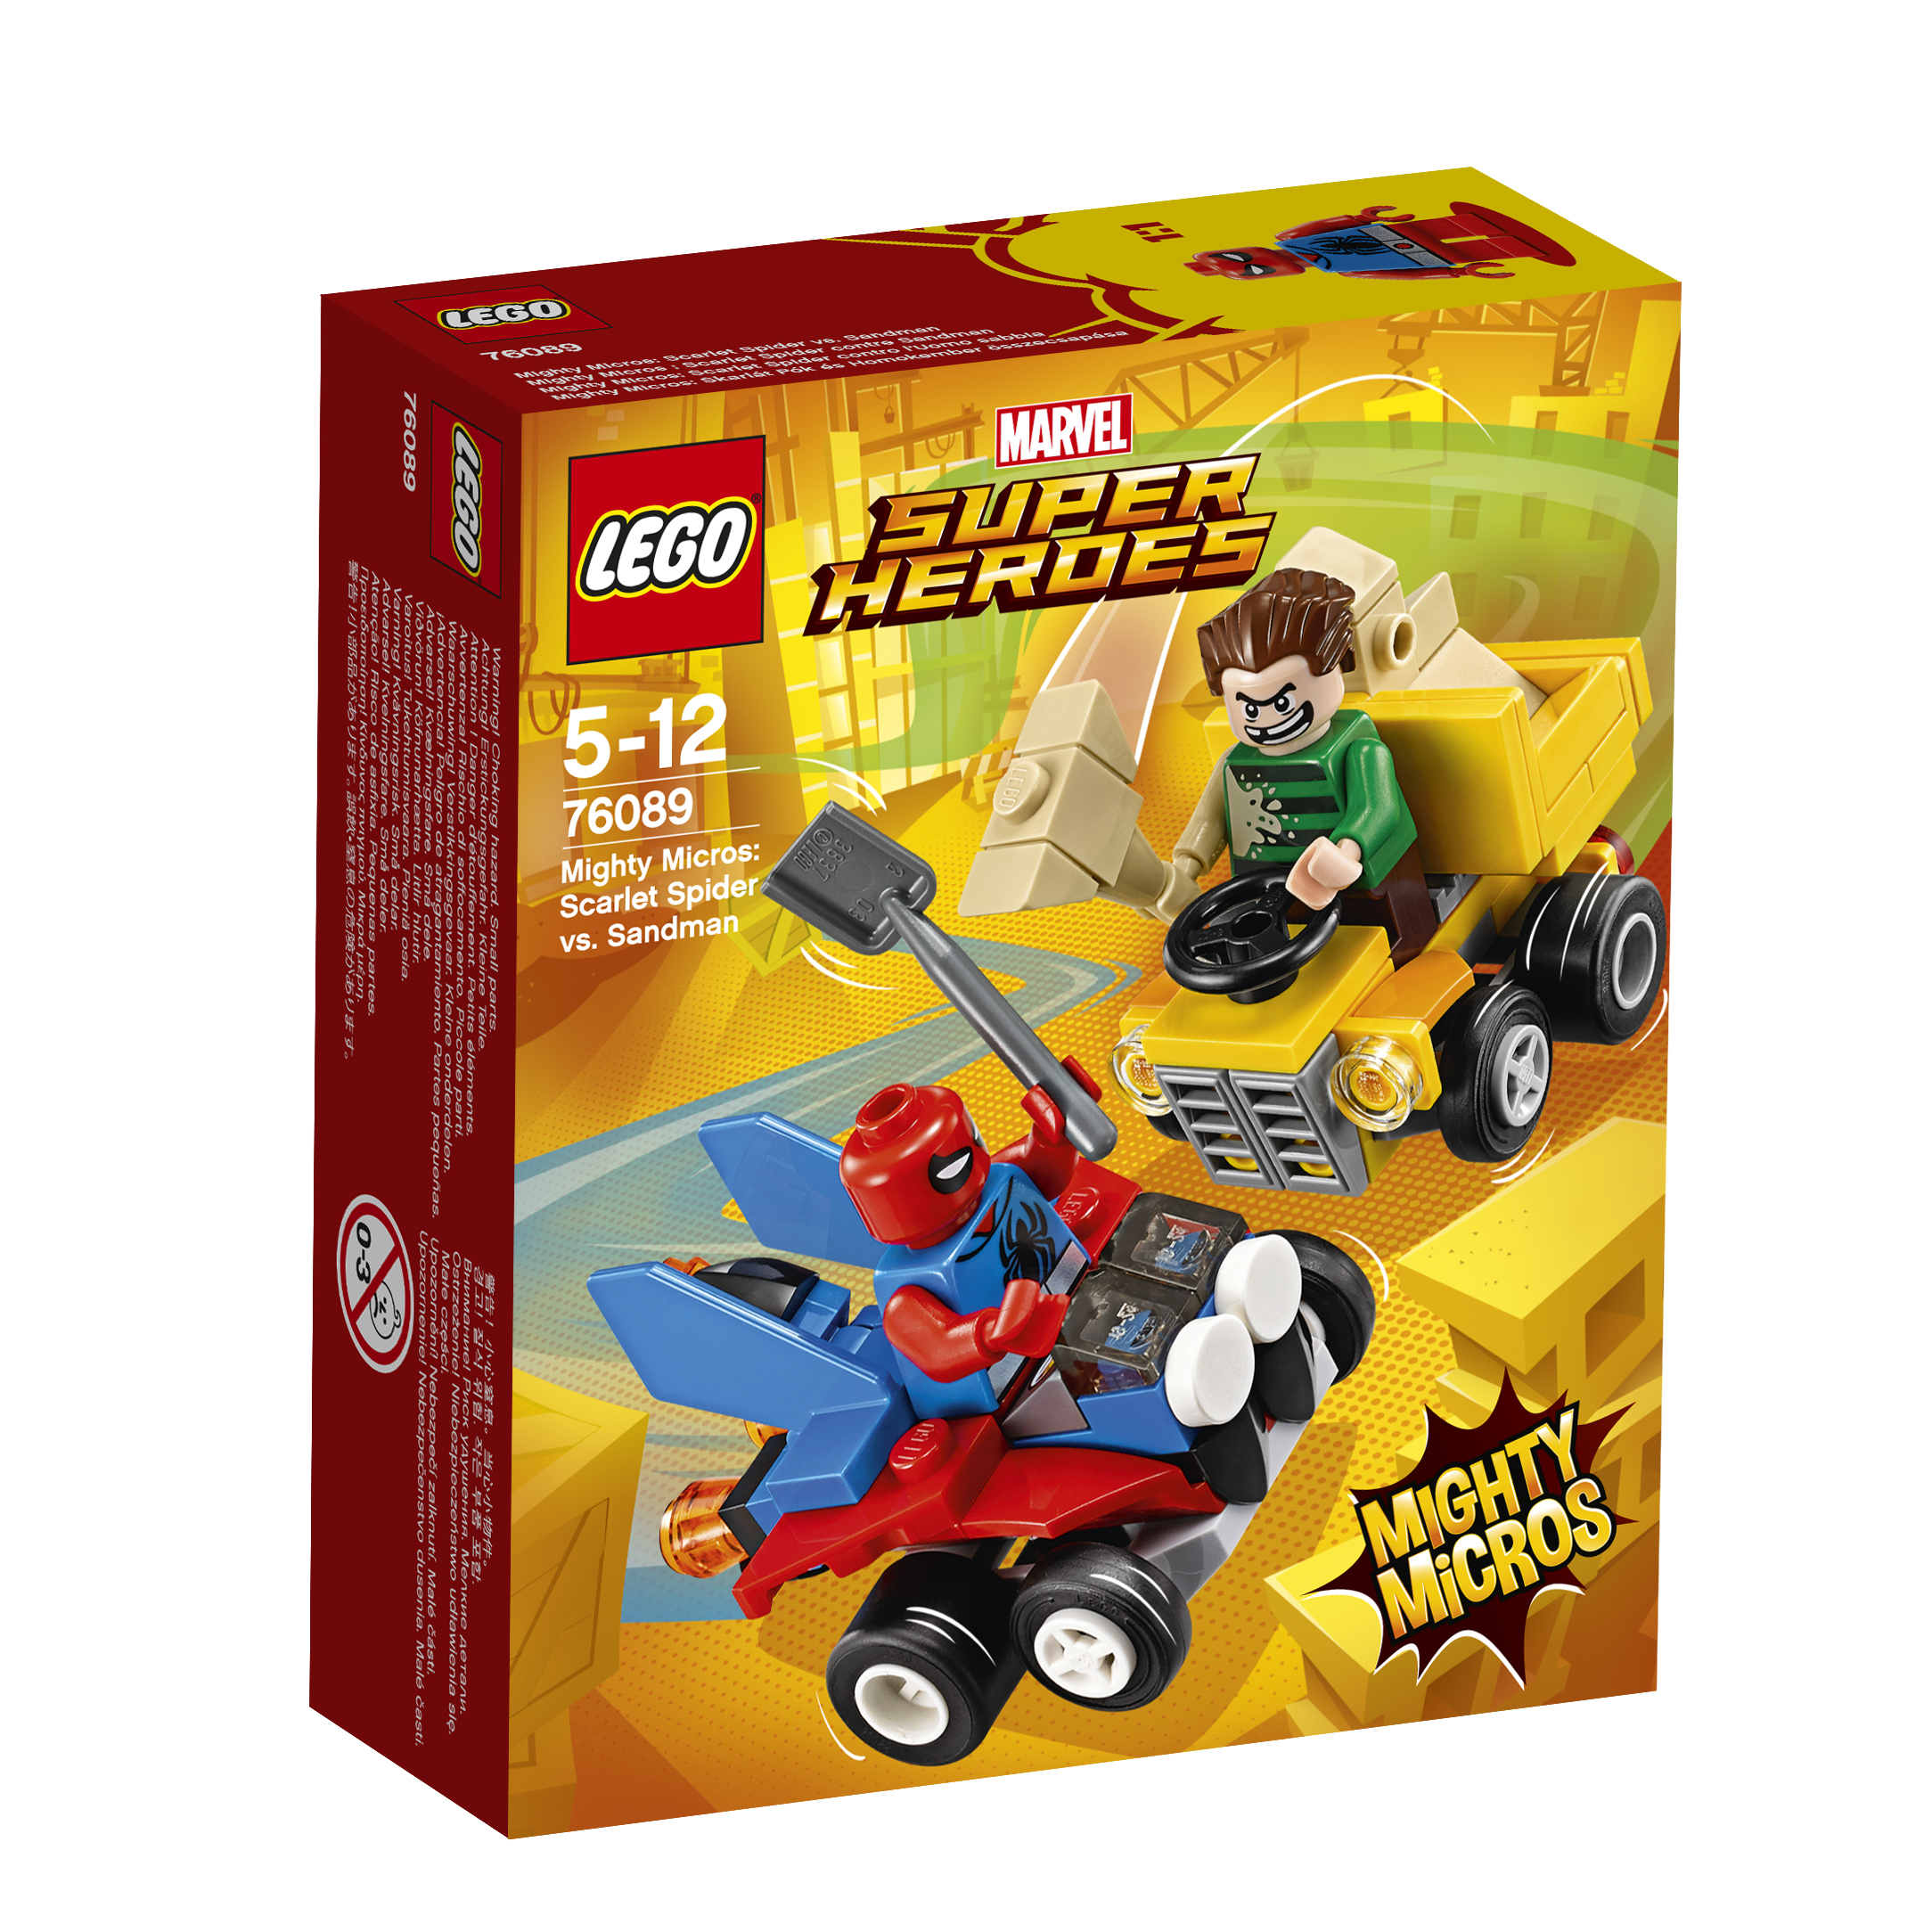 LEGO LEGO Конструктор LEGO Super Heroes 76089 Человек-паук против Песочного человека lego игрушка джуниорс убежище человека паука™ 10687 4